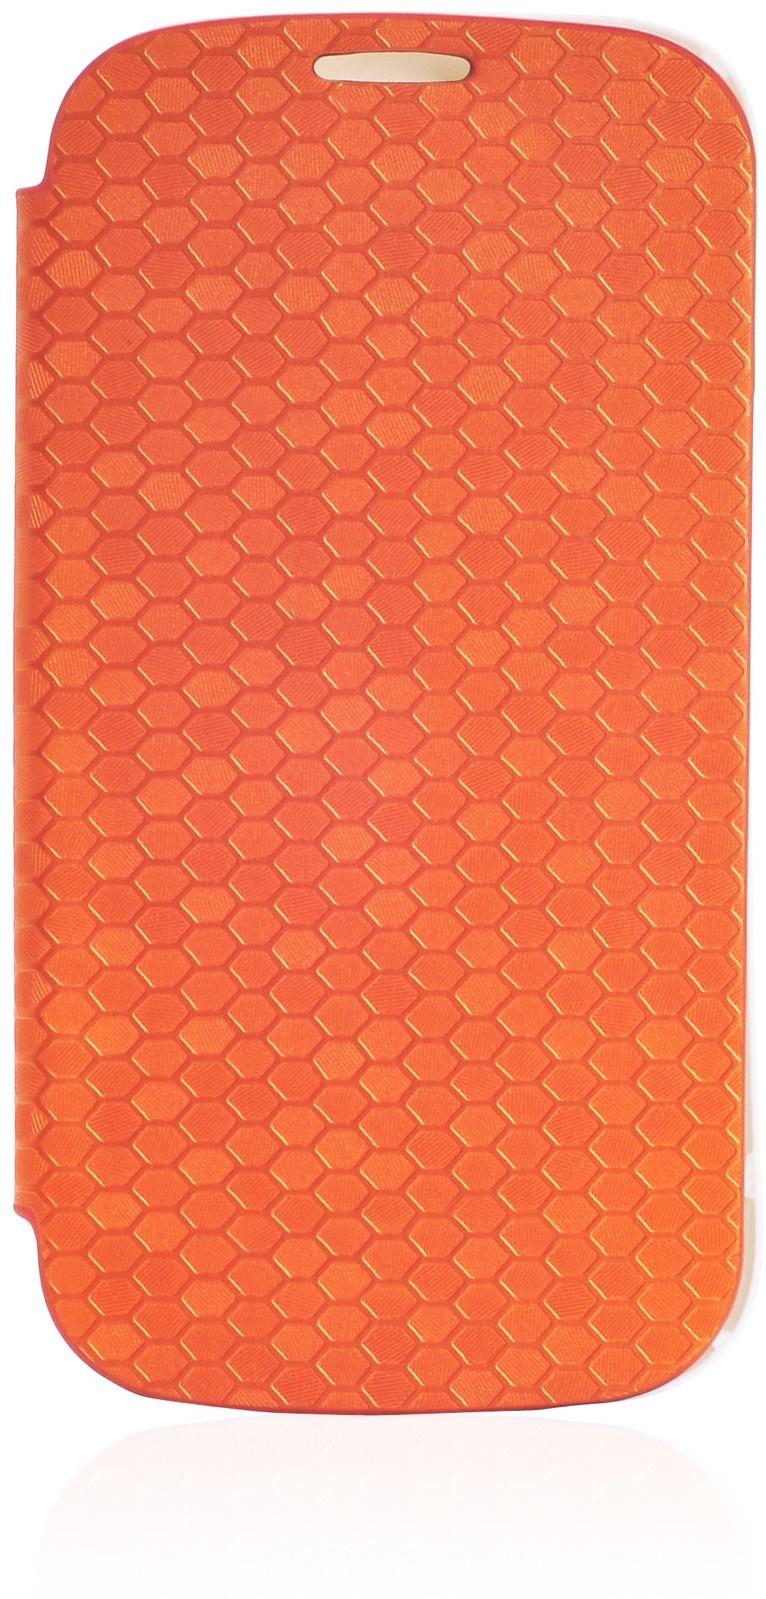 Чехол Gurdini Flip Case соты 380030 для Samsung Galaxy S3,380030, оранжевый